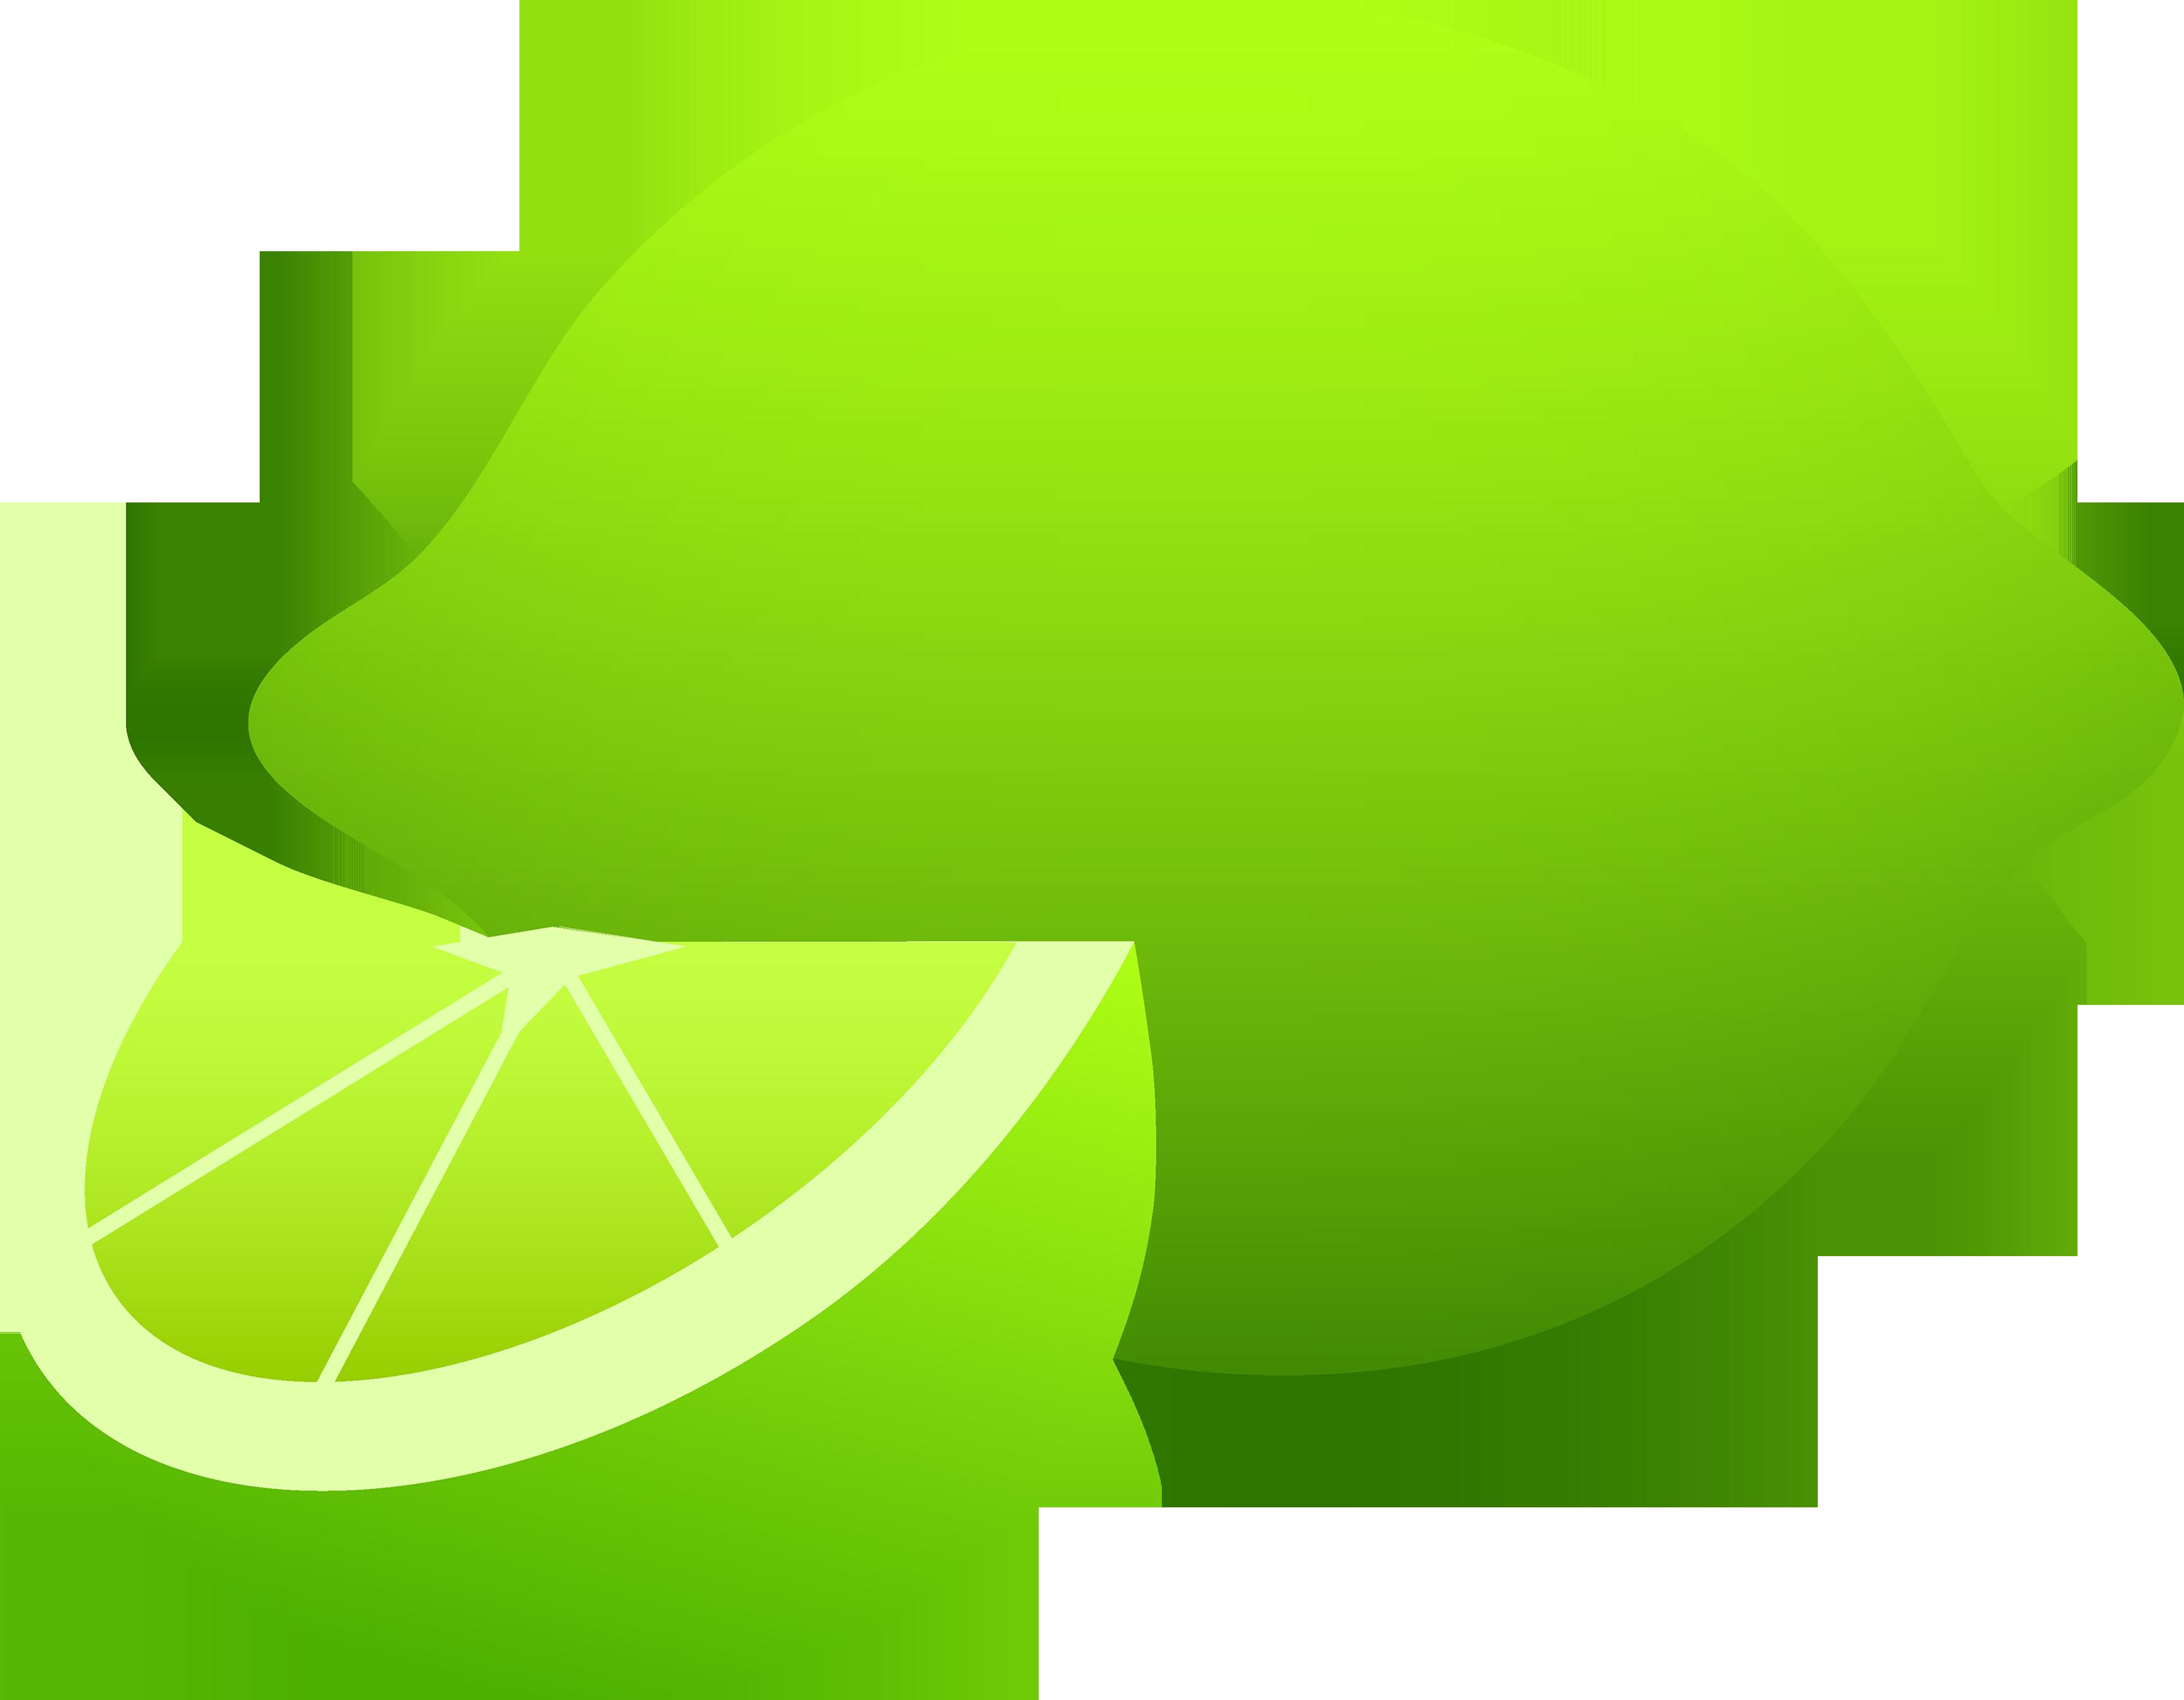 Lime transparent background